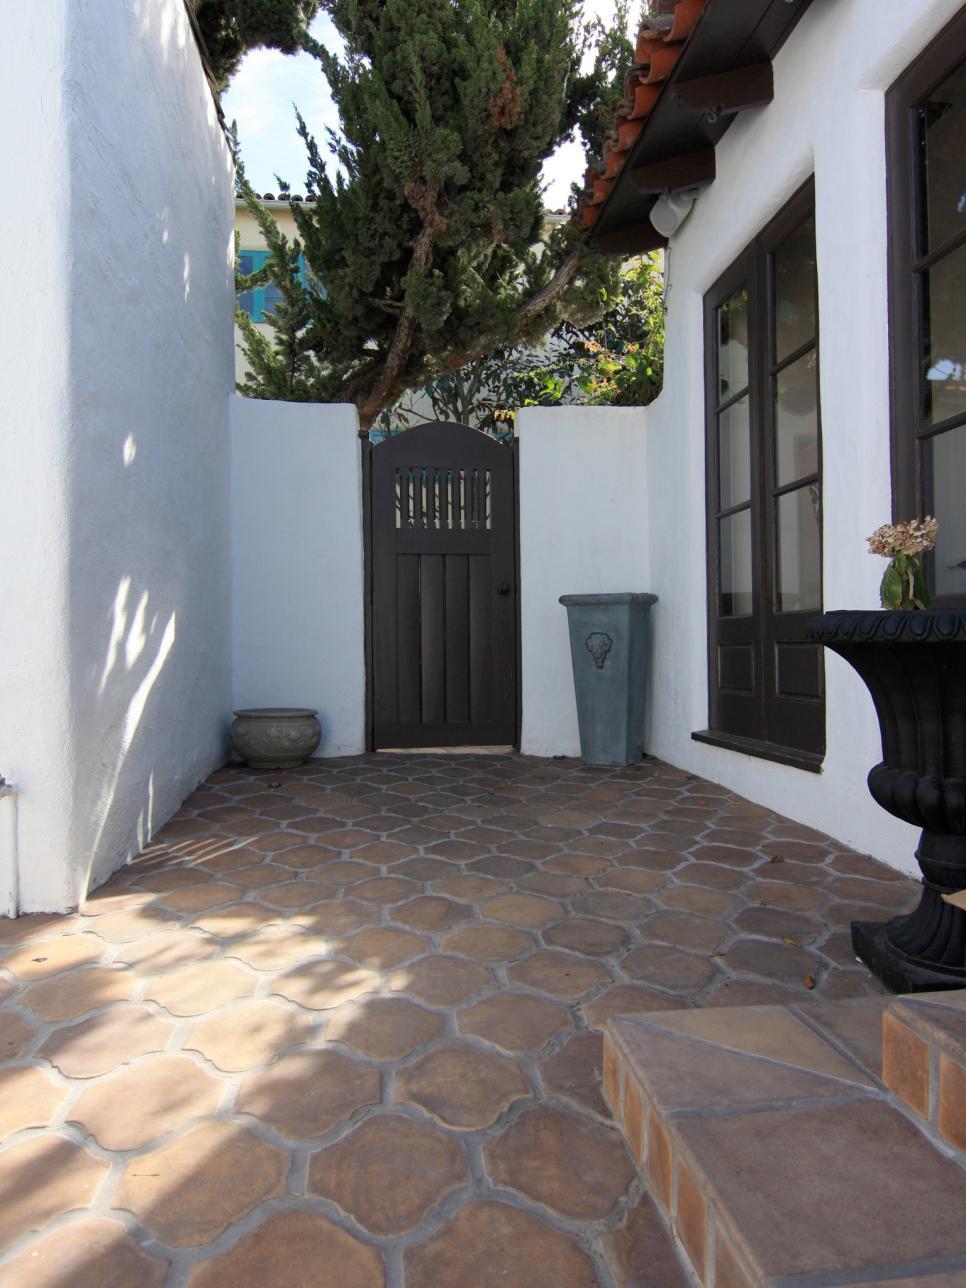 Светящаяся плитка во дворе дома